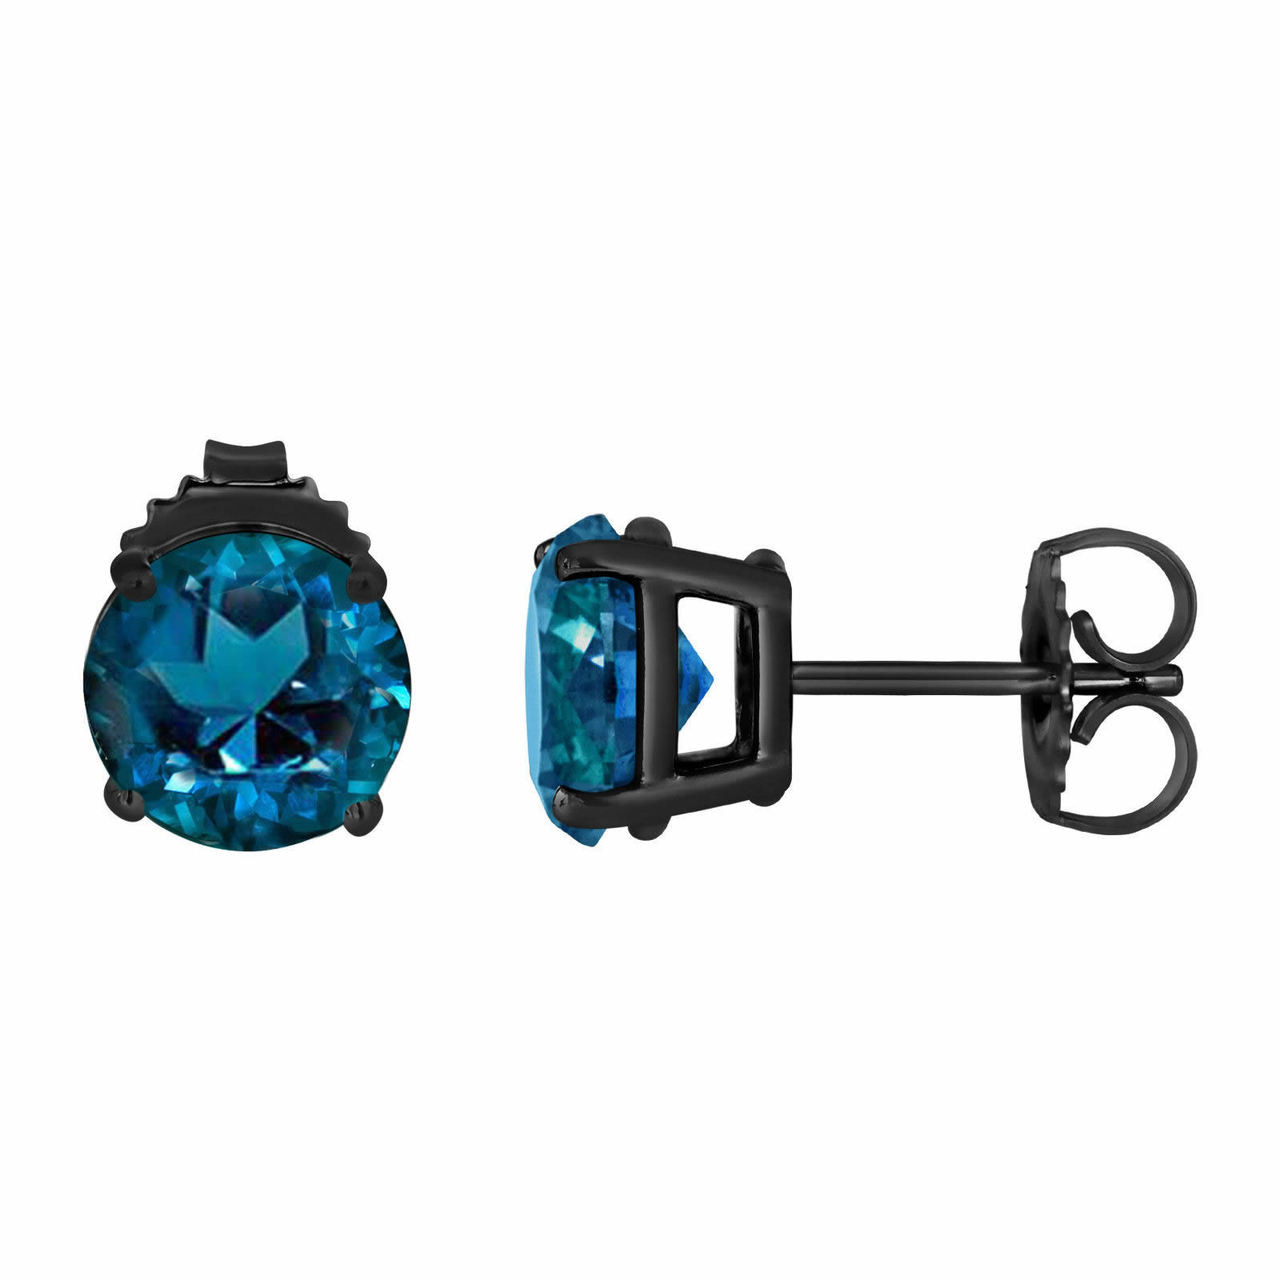 3eeef9bfe London Blue Topaz Stud Earrings Vintage Style 14K Black Gold 2.00 Carat  VVS1 HandMade Birthstone